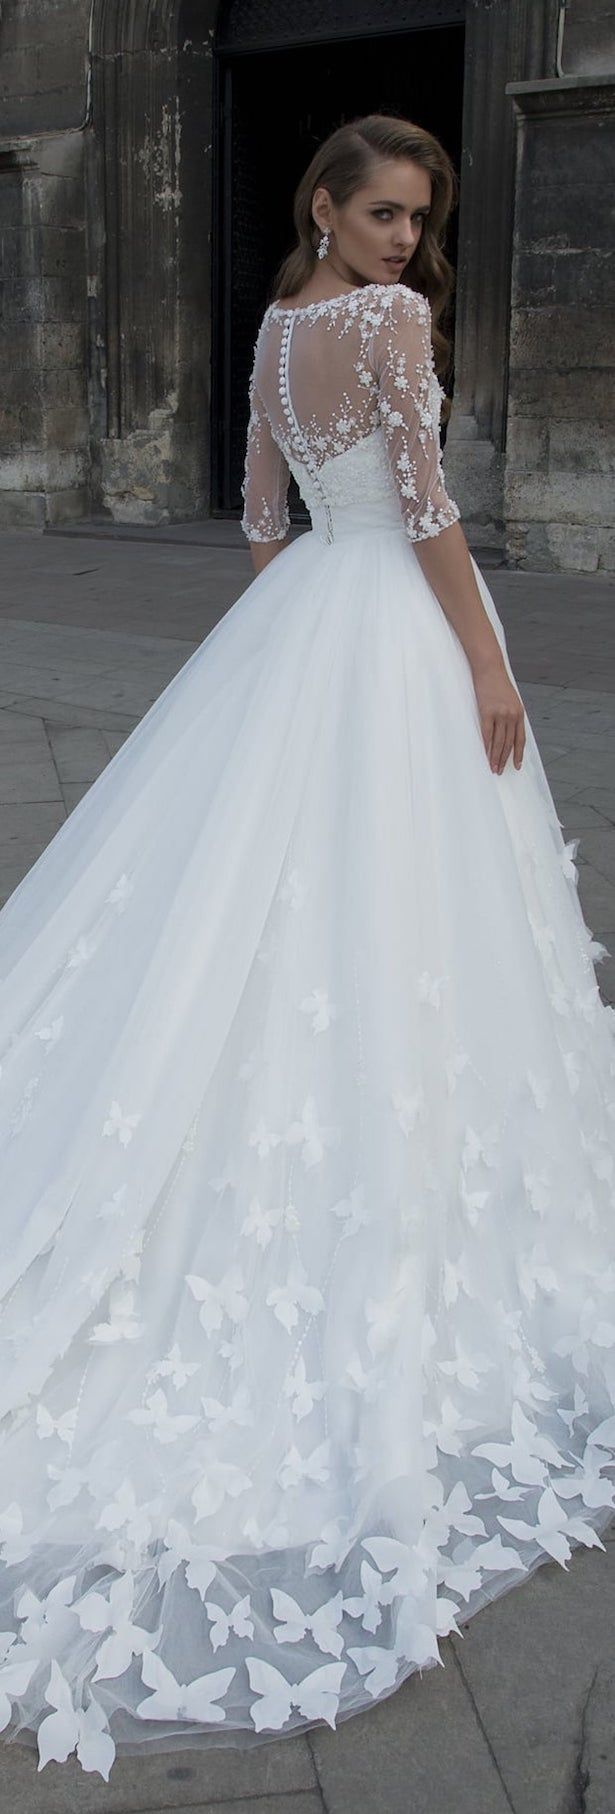 Modern Beautiful Bridal Gowns Wedding Dresses Inspiration - All ...